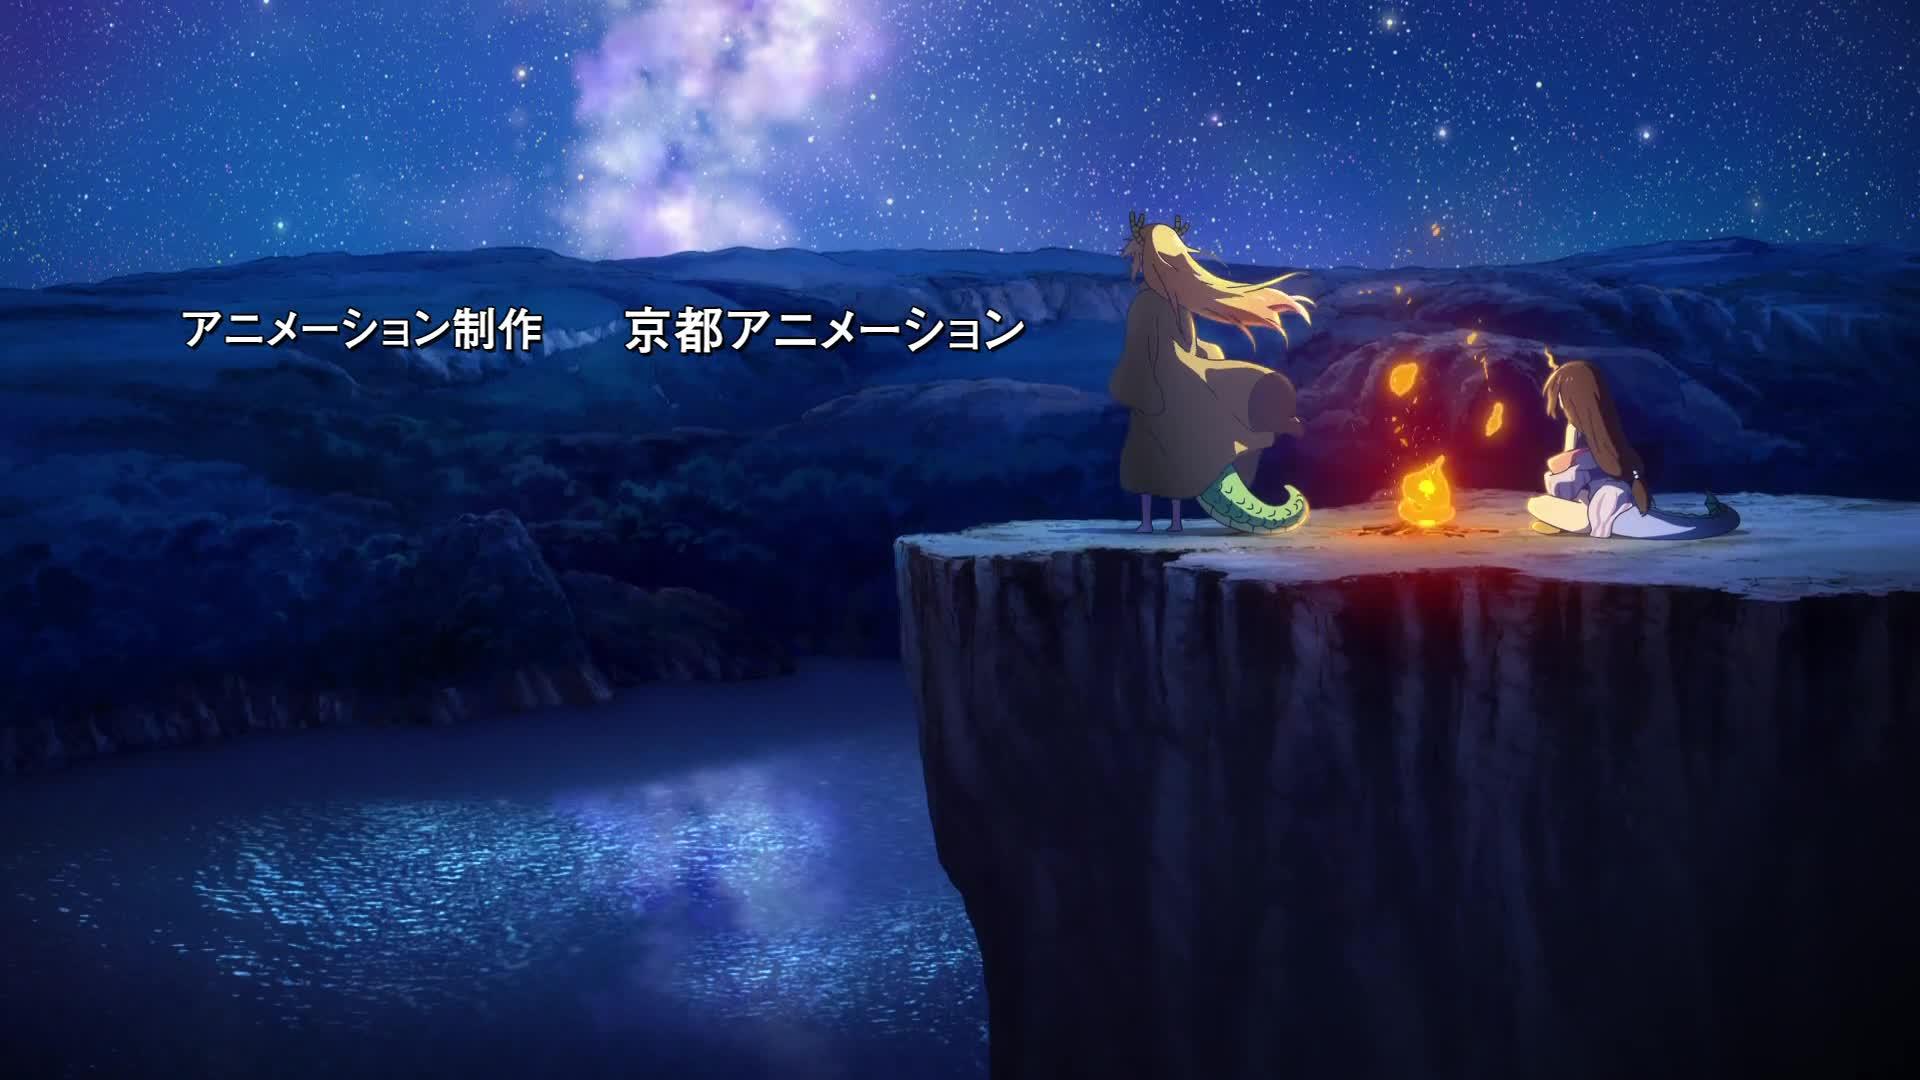 Kobayashi-san Chi no Maid Dragon S